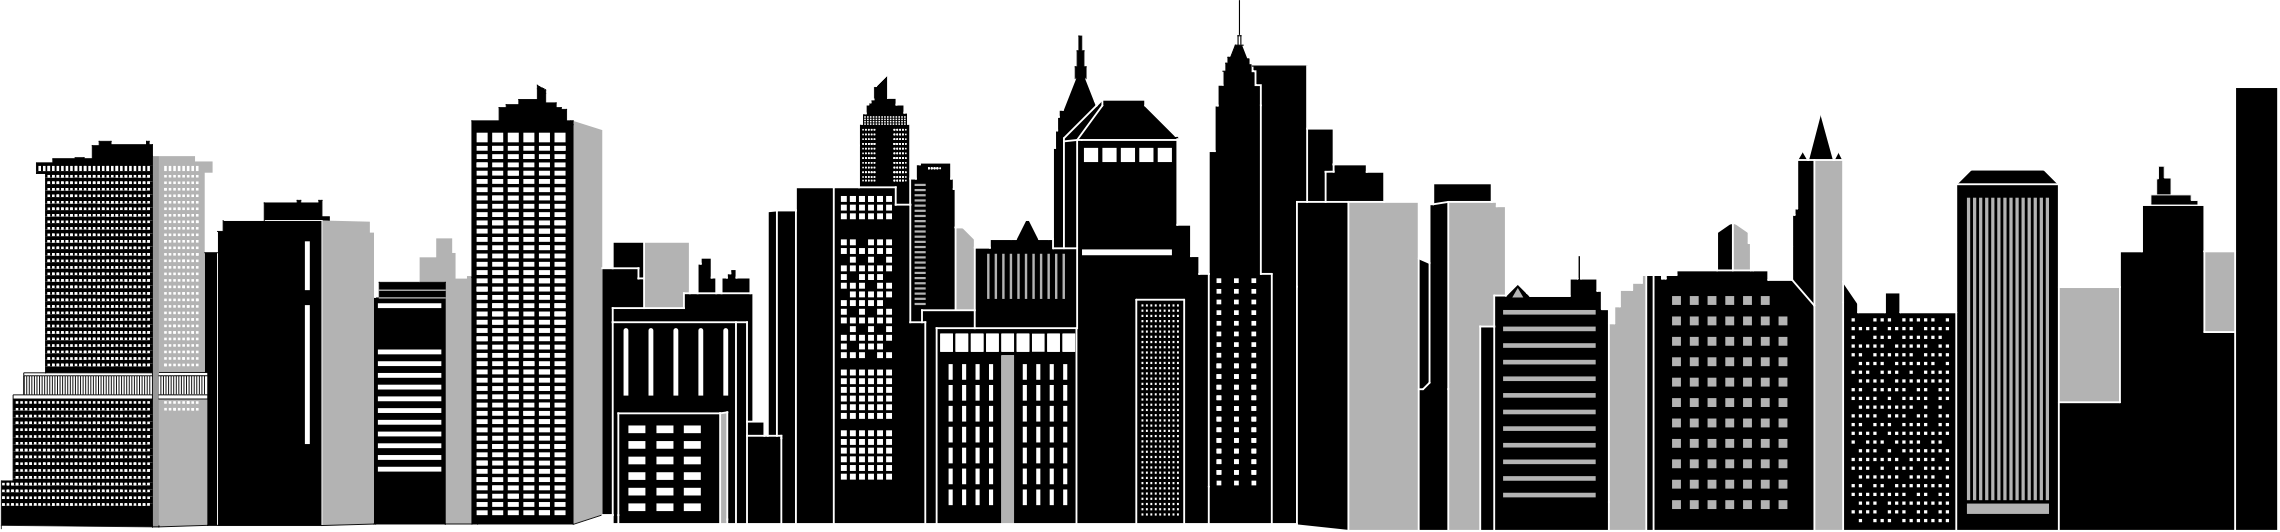 Pin Download Cityscape Skyline London Engl Wallpaper ...